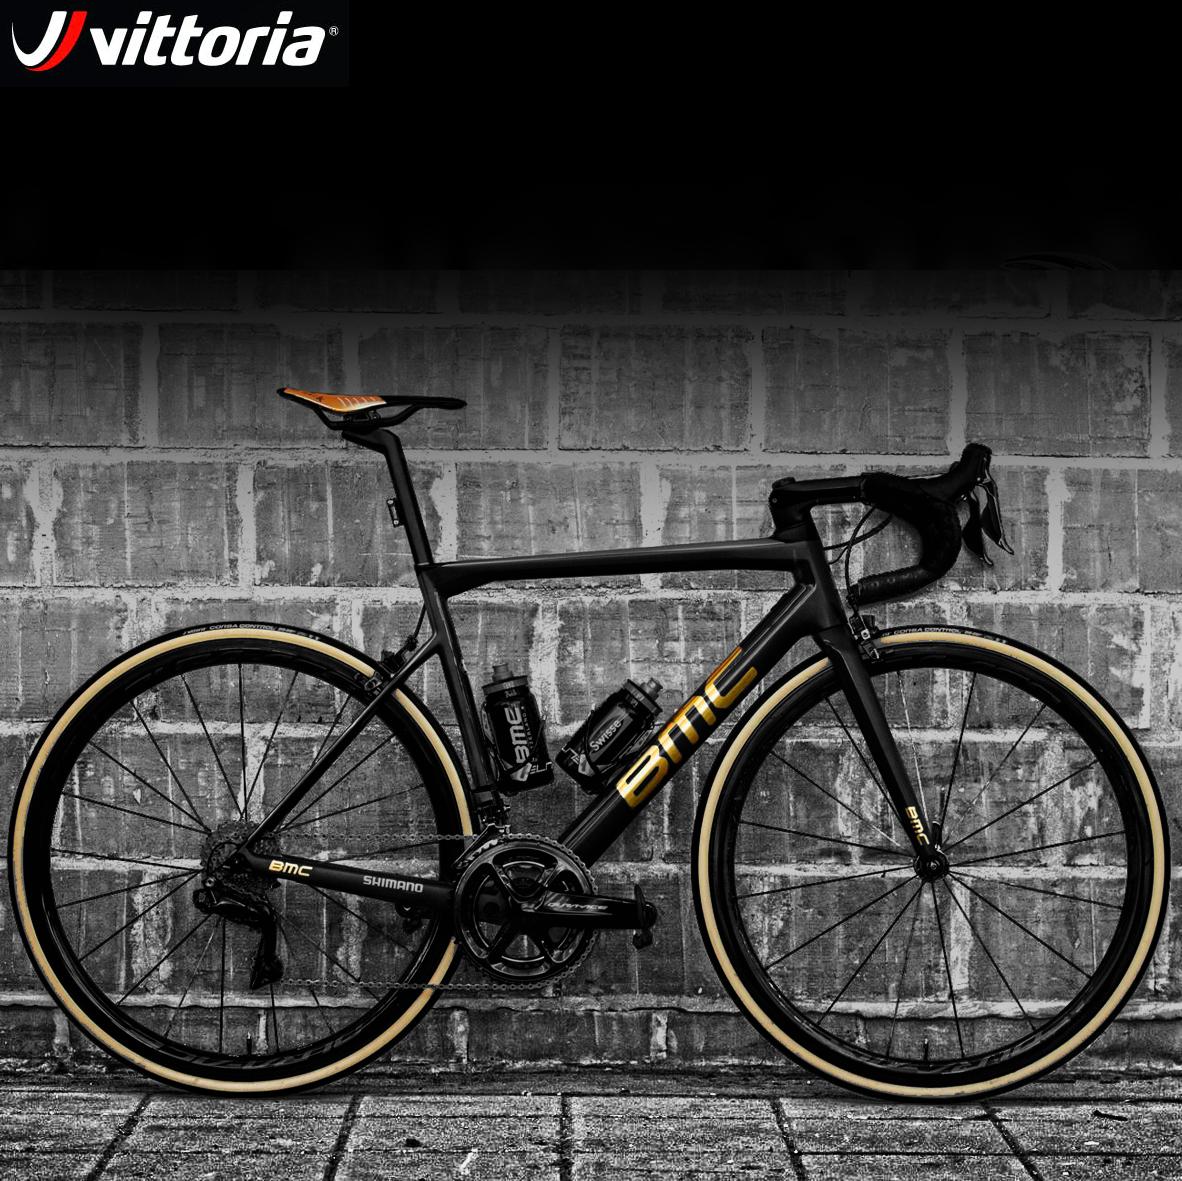 f4285c2d2f2 Vittoria Corsa Control Graphene Tyres Tires. BMC Bike. Credit Chris Auld  Photo